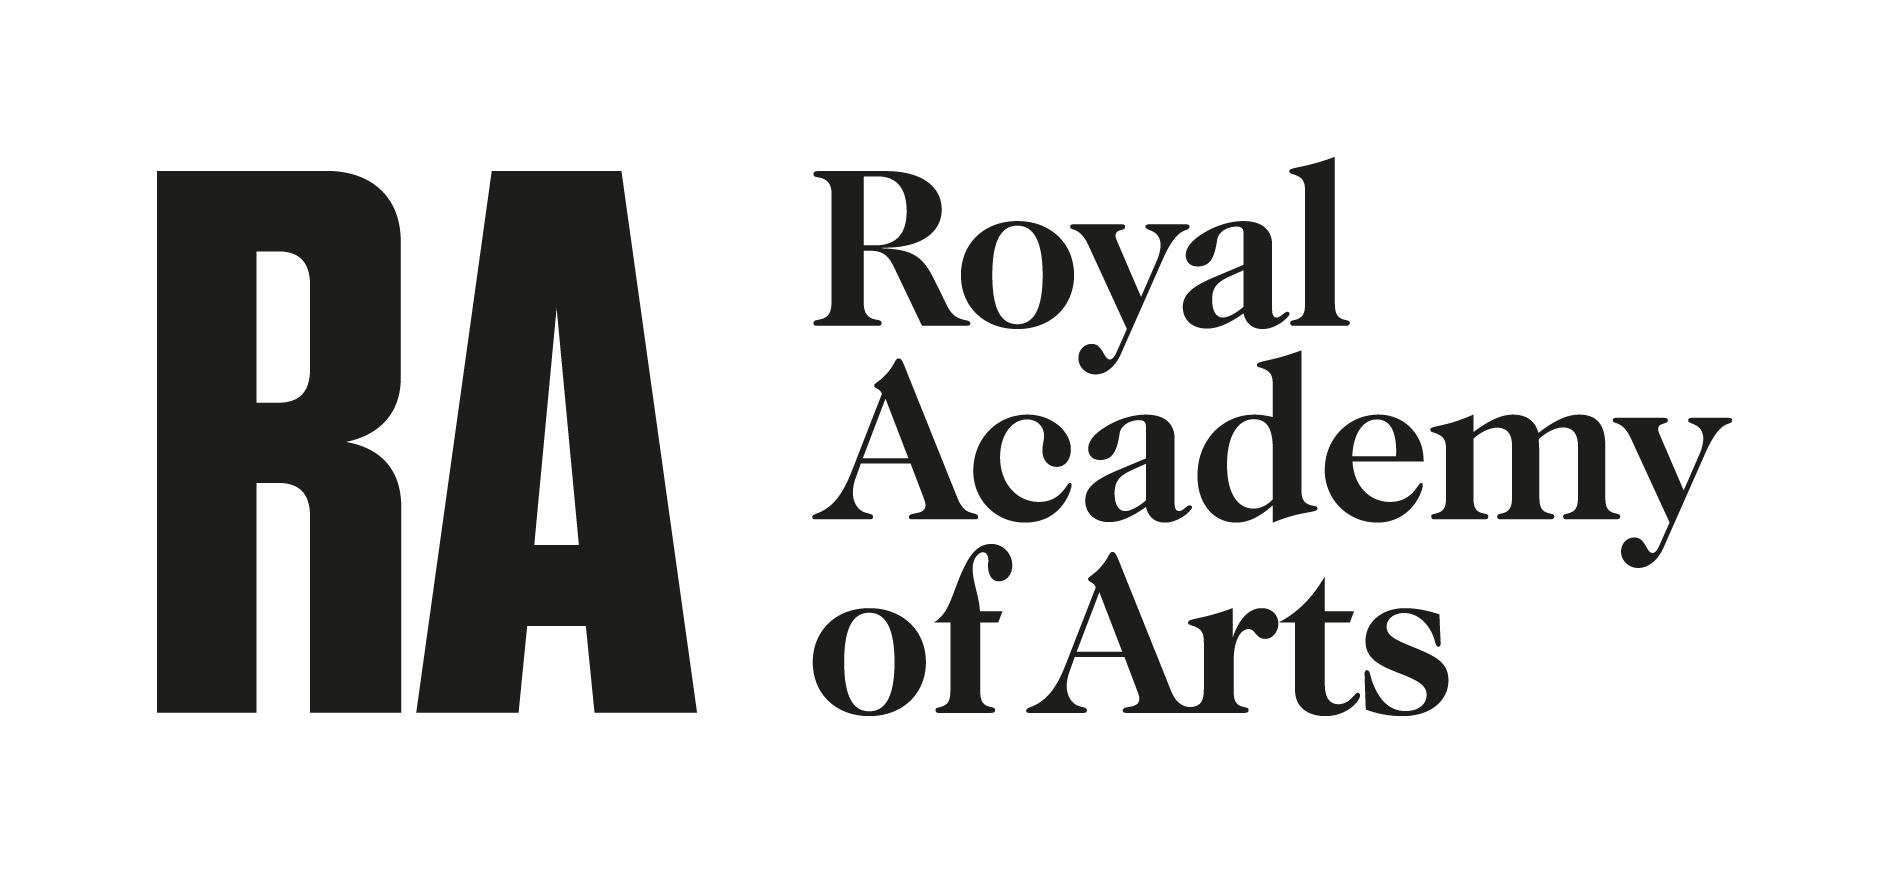 royal_academy_of_arts.jpg